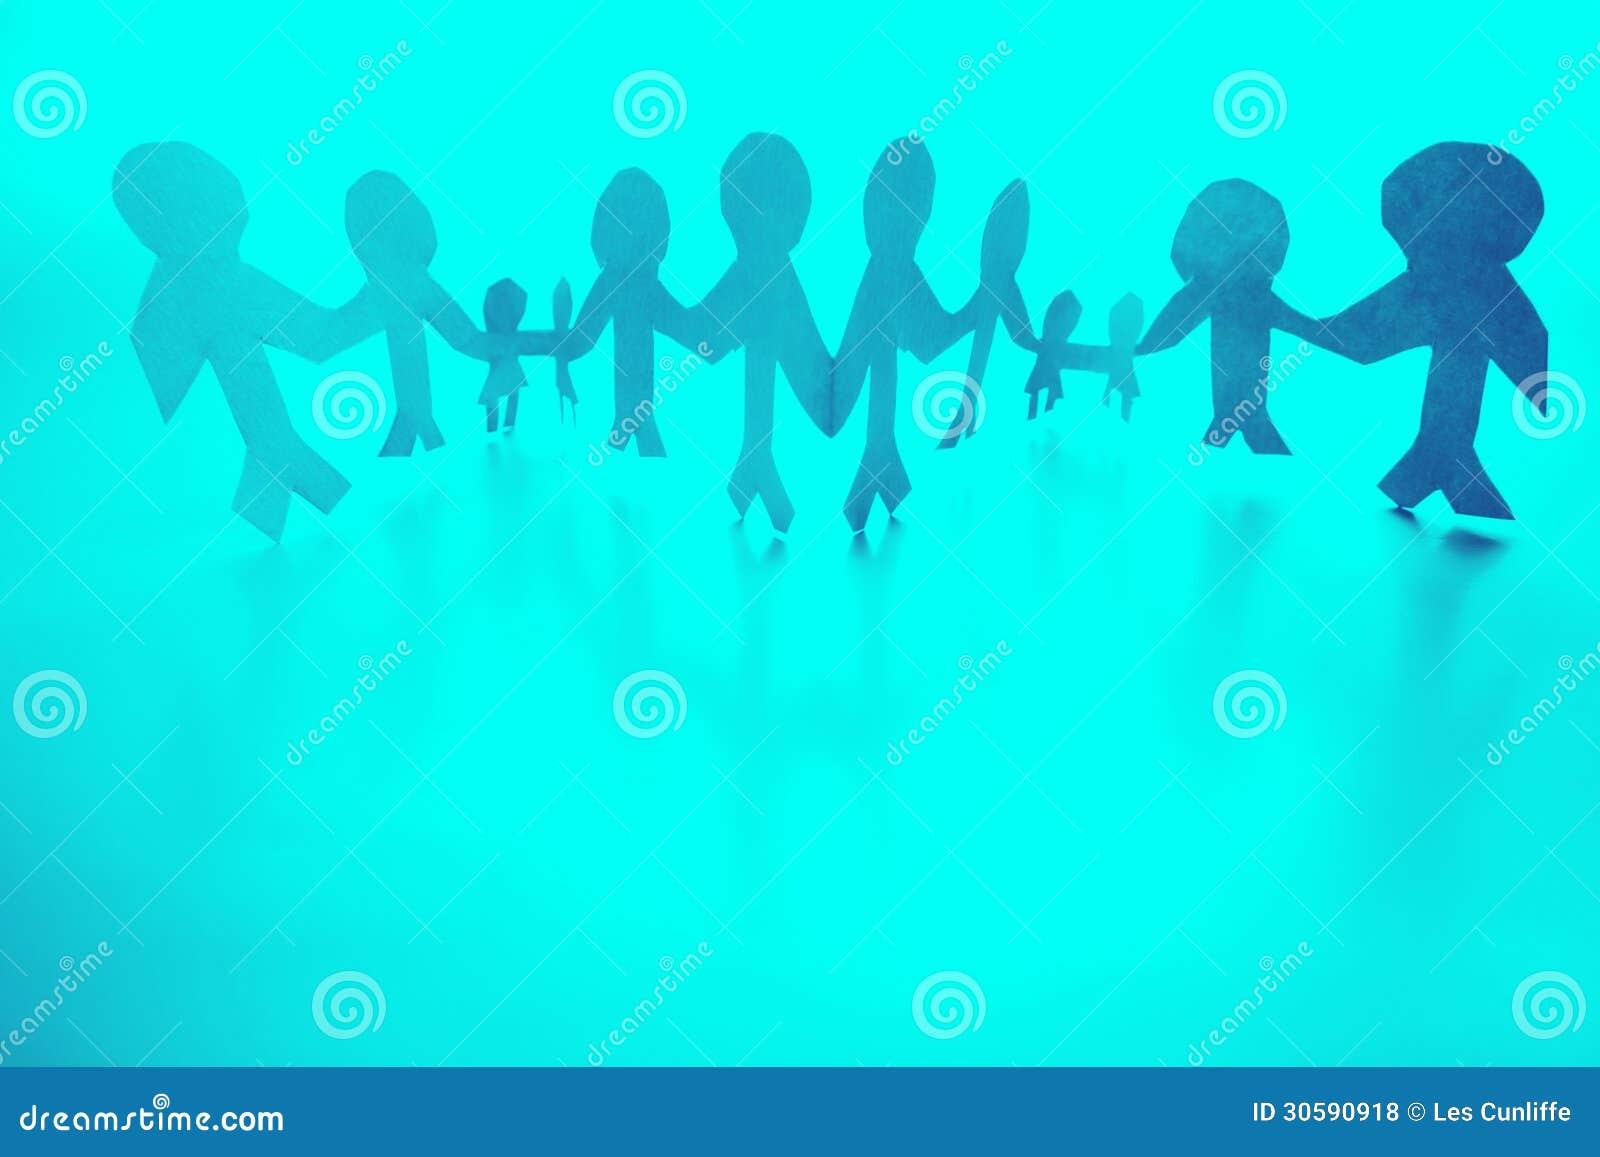 Teamwork Royalty Free Stock Photos - Image: 30590918